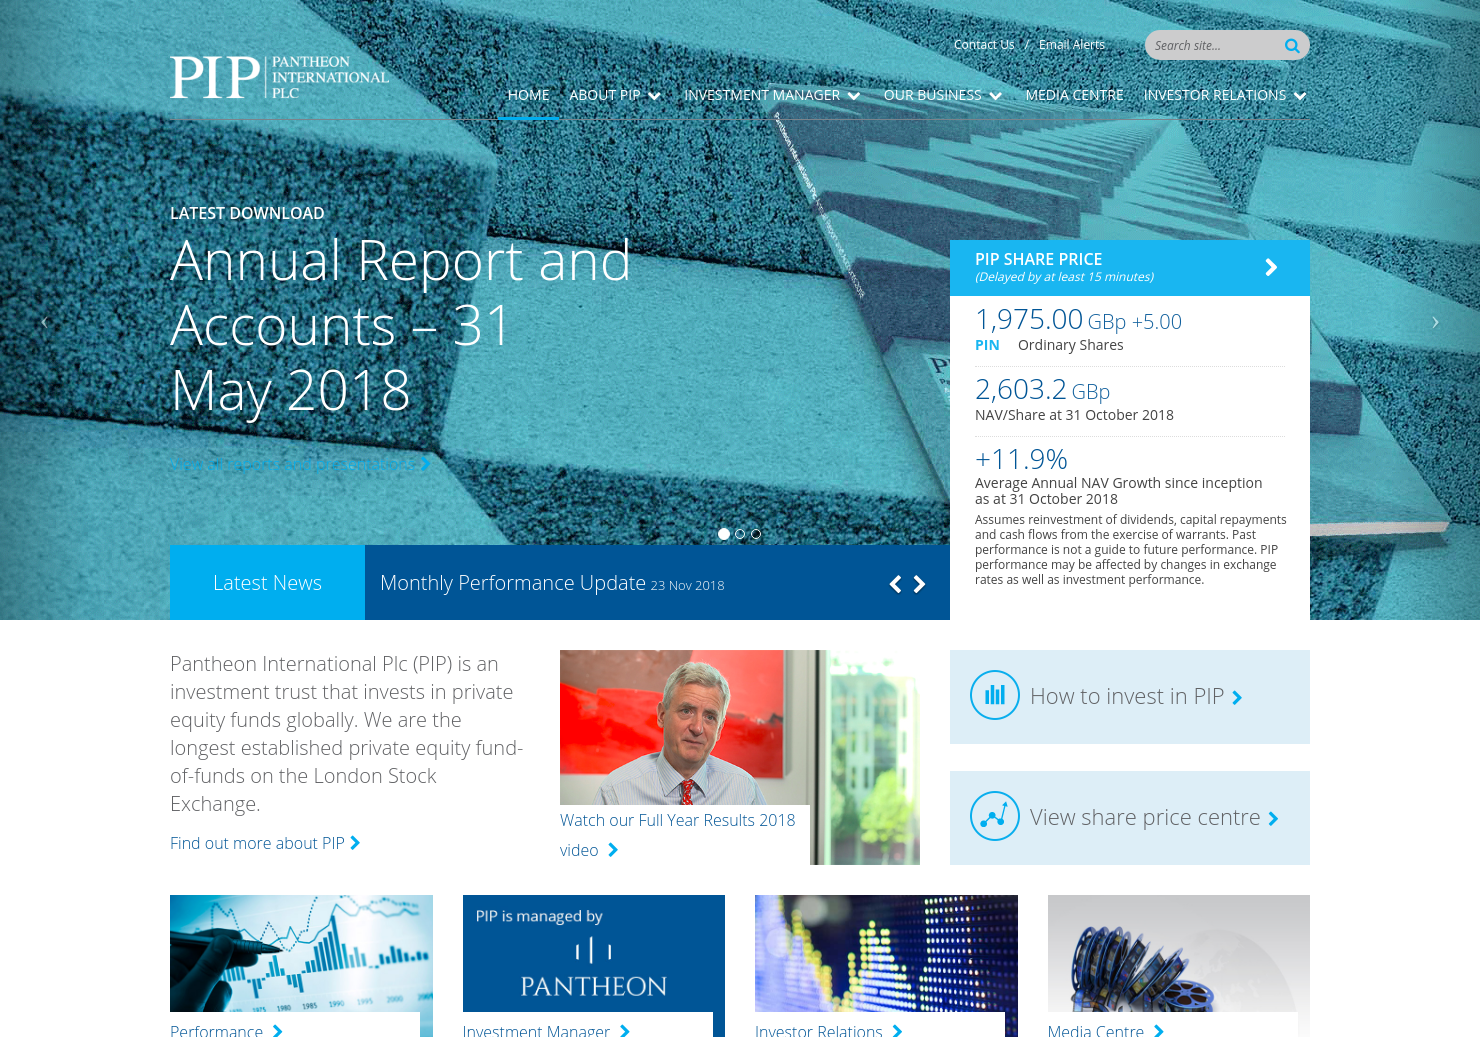 Pantheon International Home Page